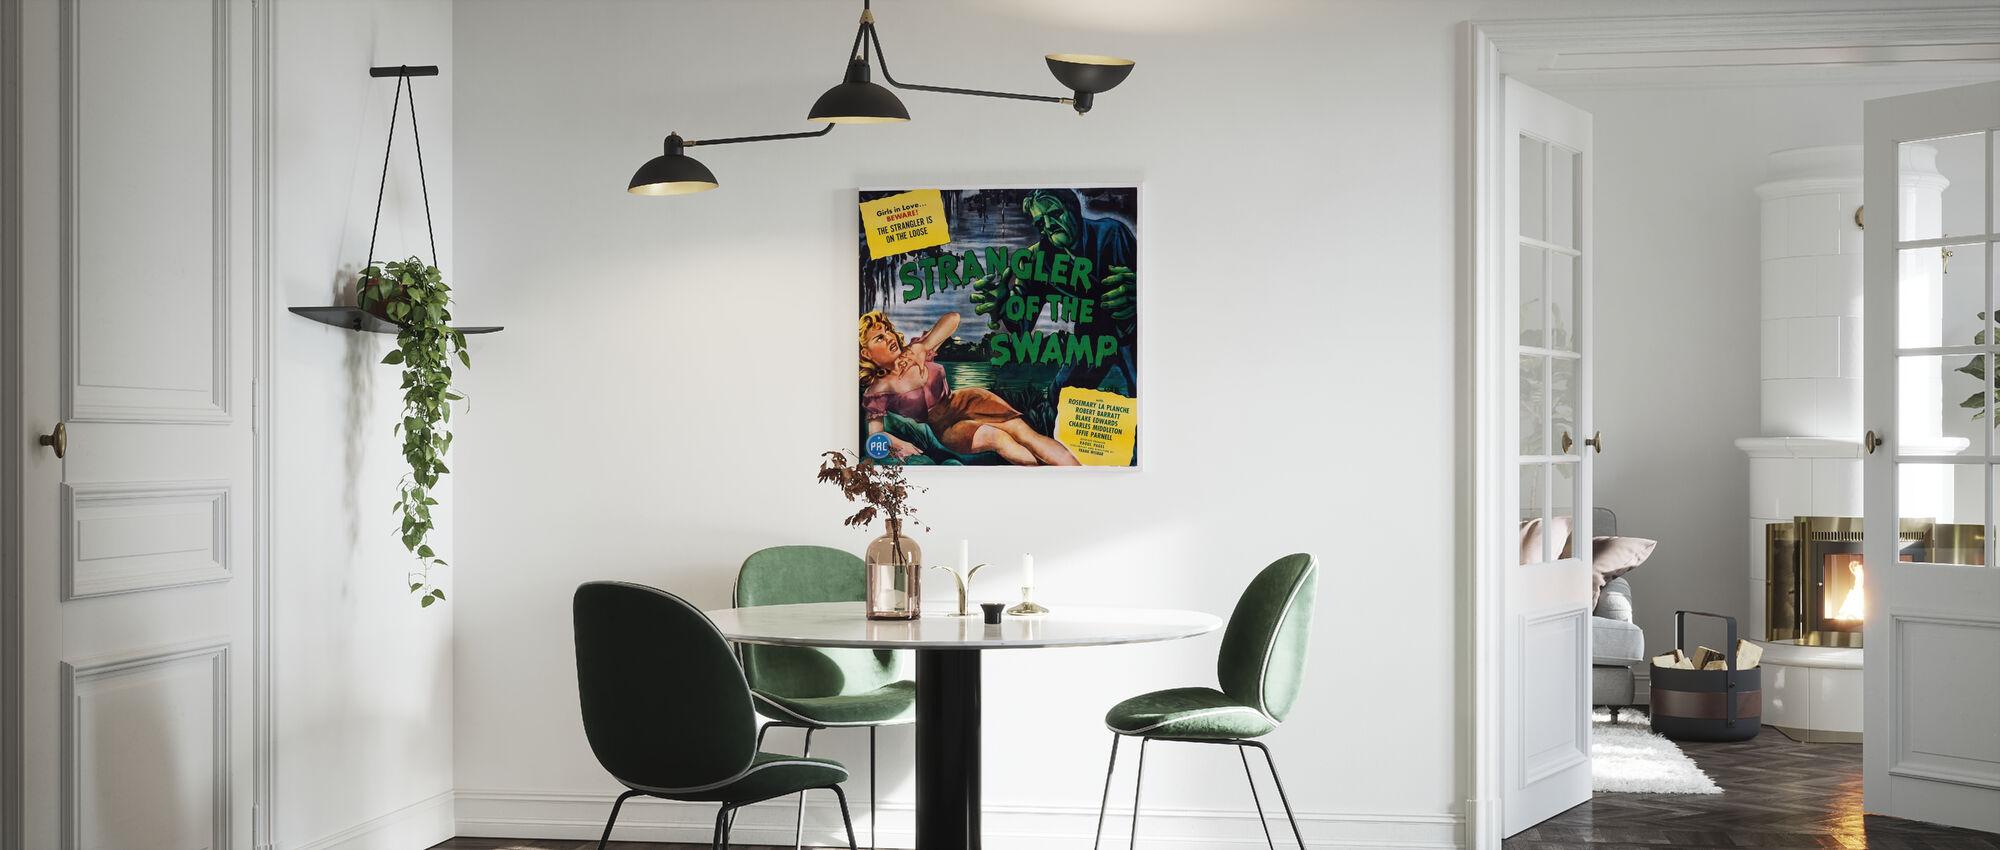 Movie Poster Strangler of the Swamp - Canvas print - Kitchen